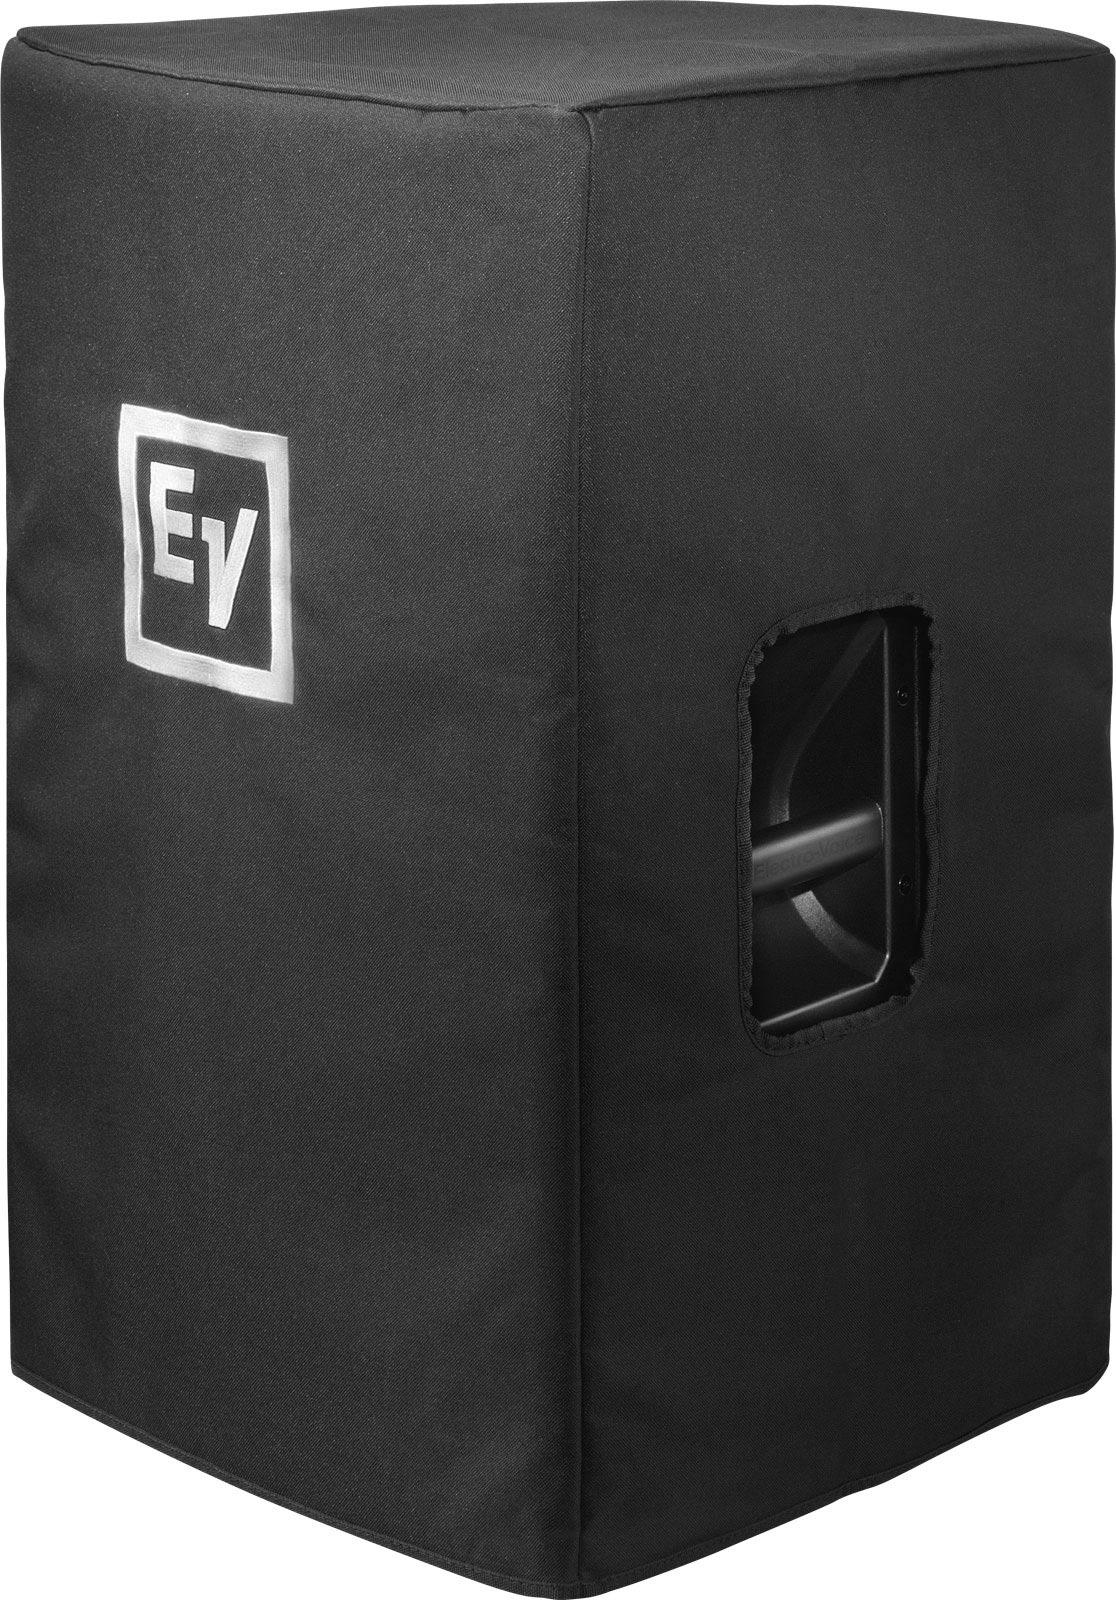 Electrovoice Ekx-15-cvr